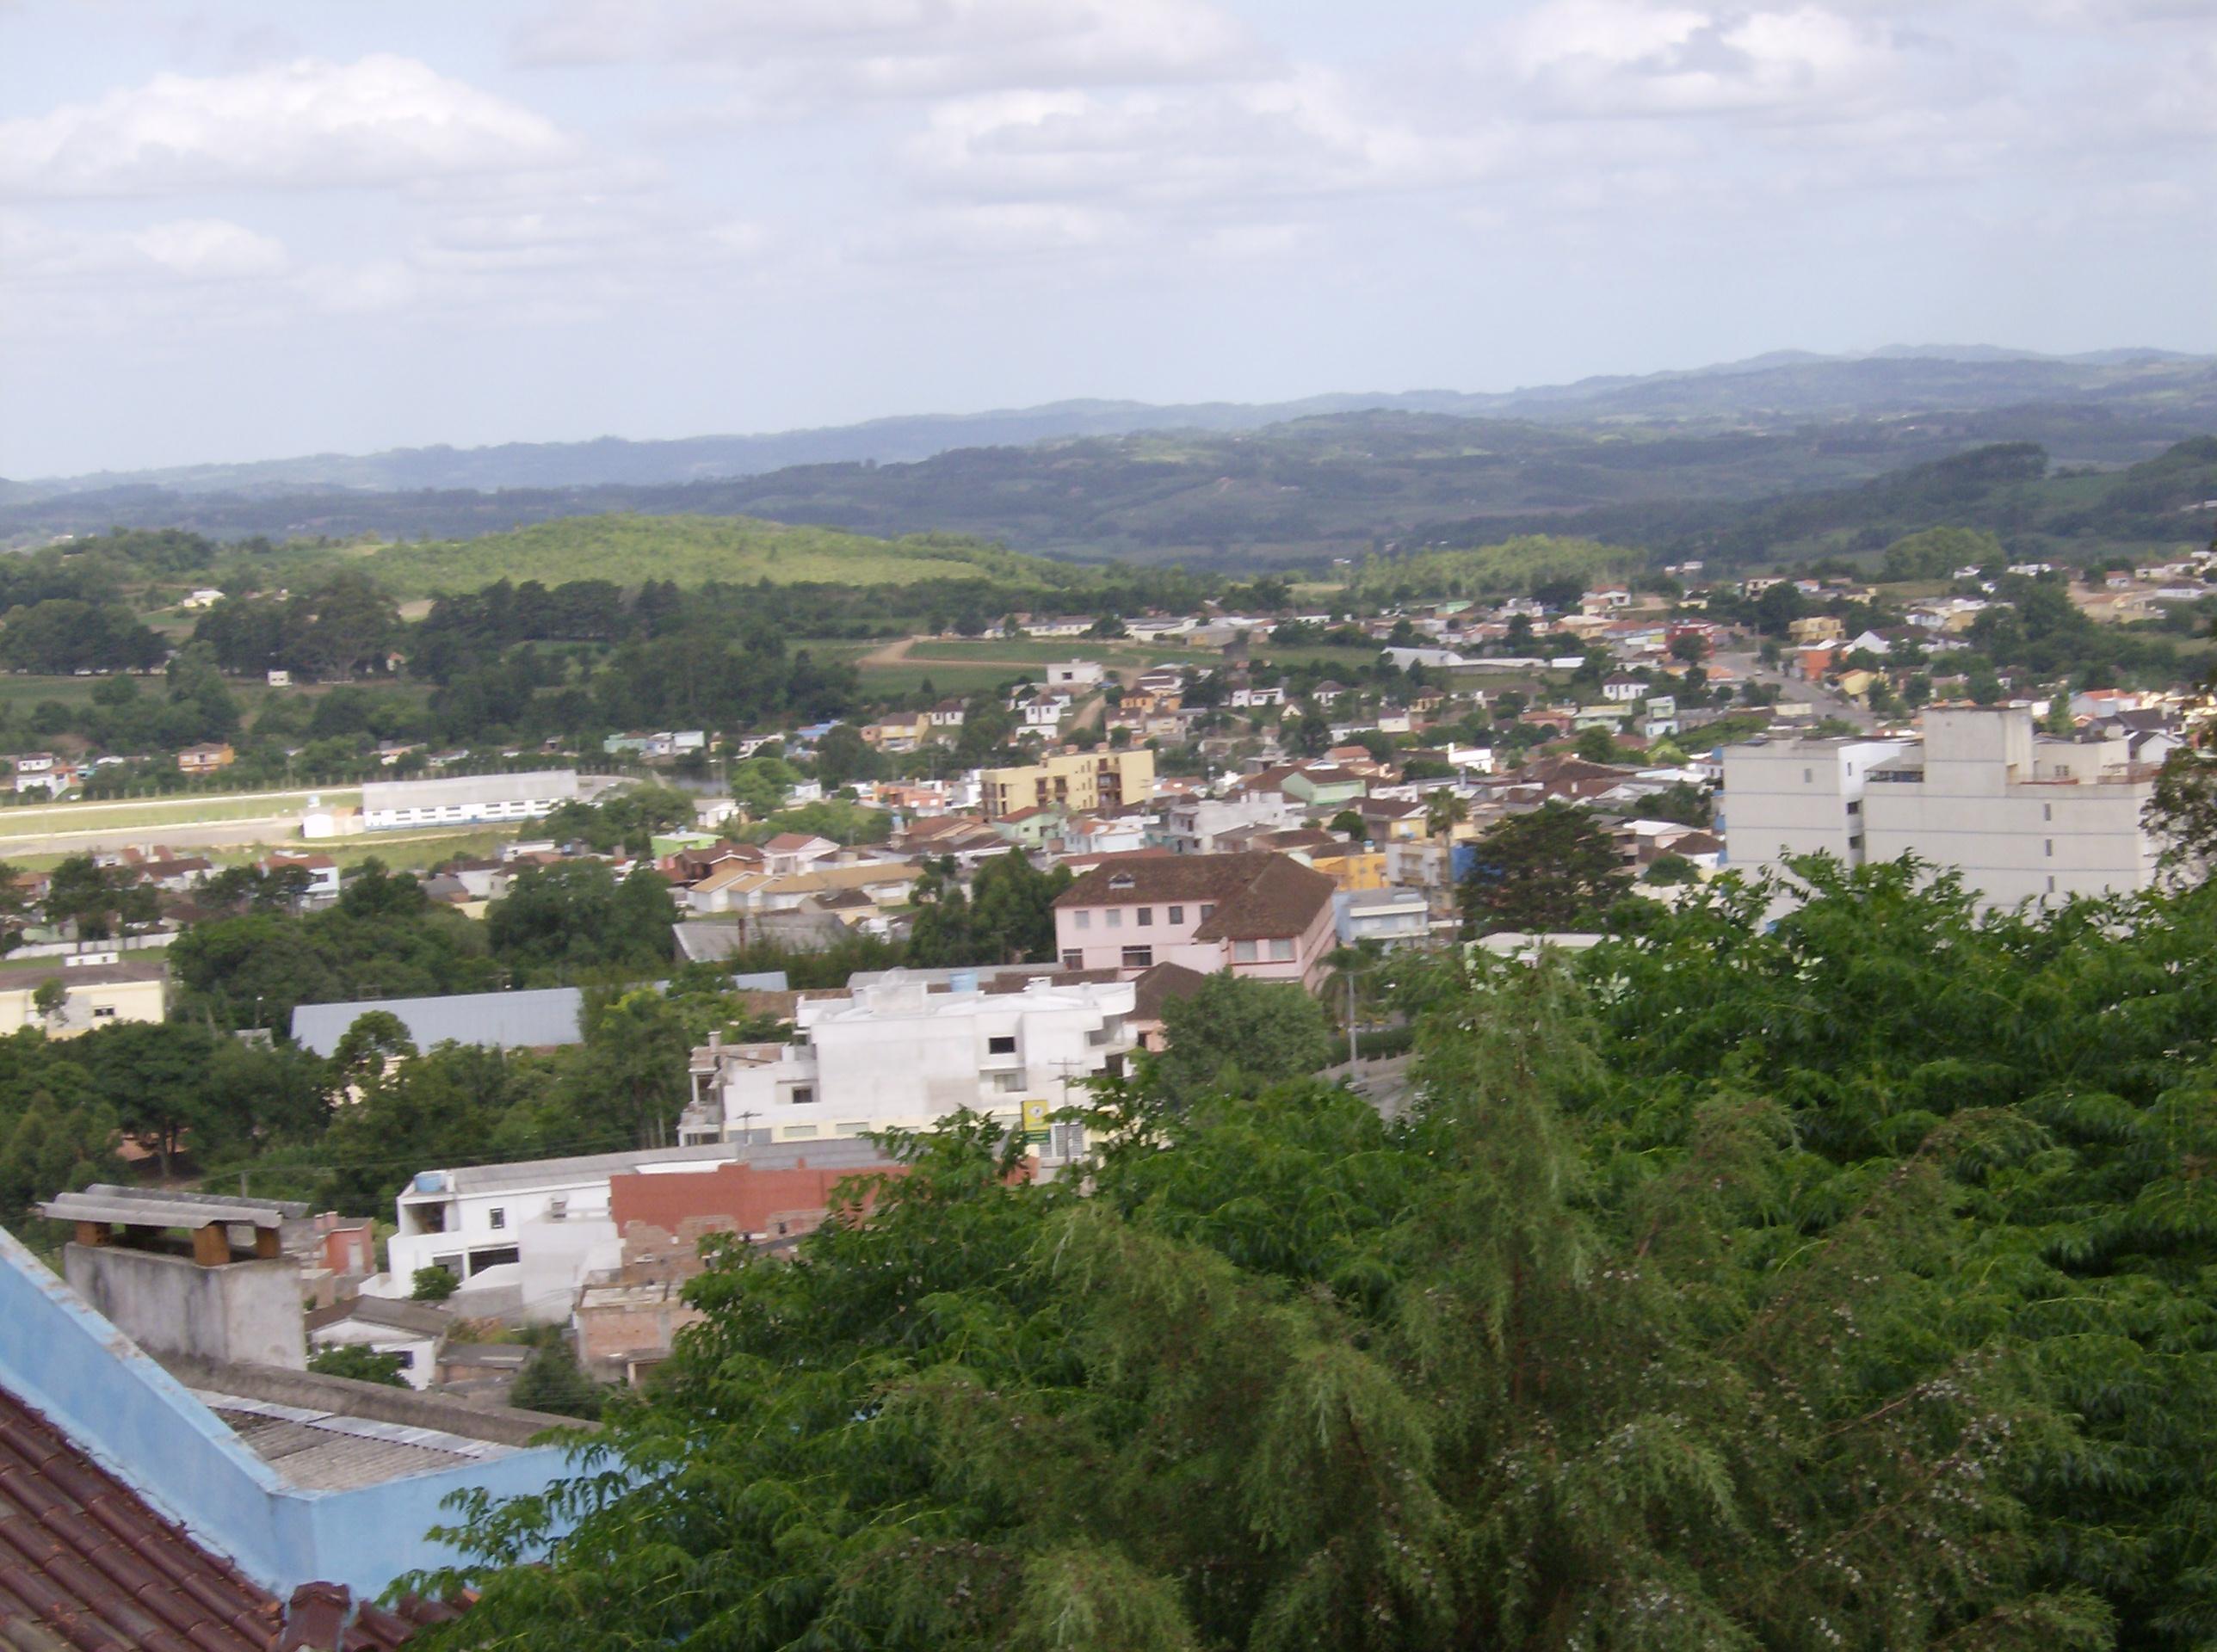 Canguçu Rio Grande do Sul fonte: upload.wikimedia.org